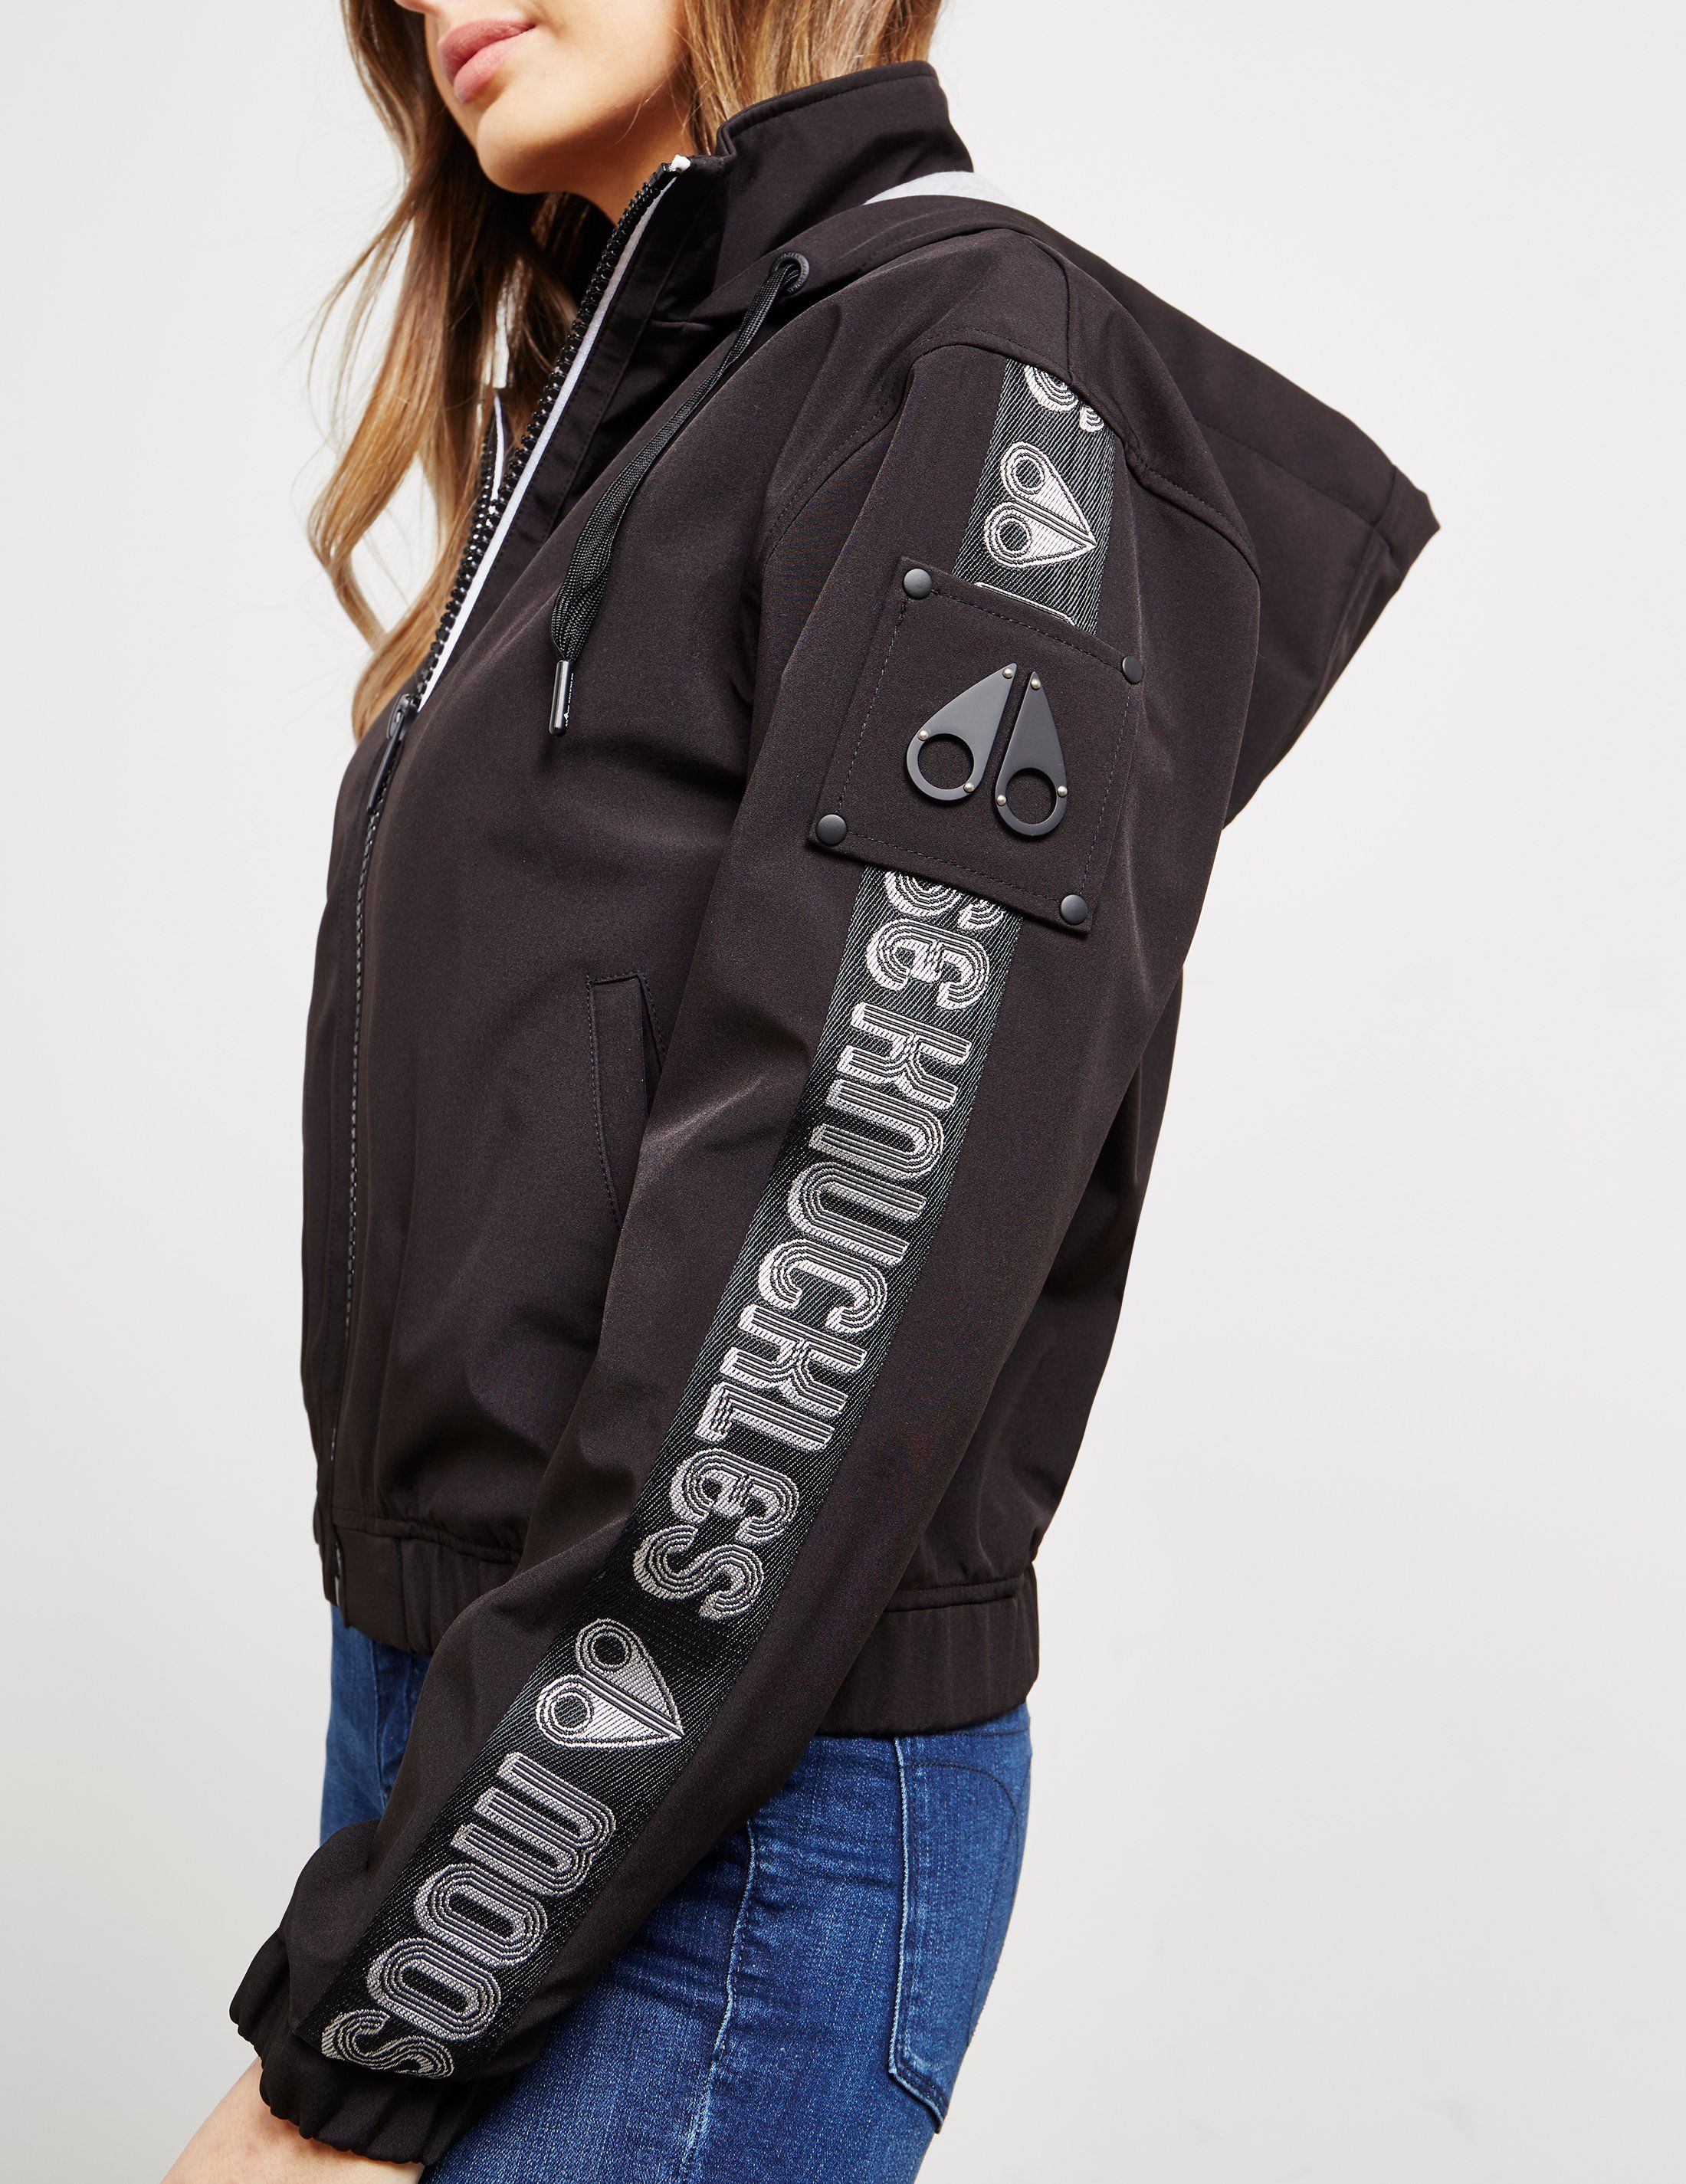 Moose Knuckles Angrignon Bomber Jacket